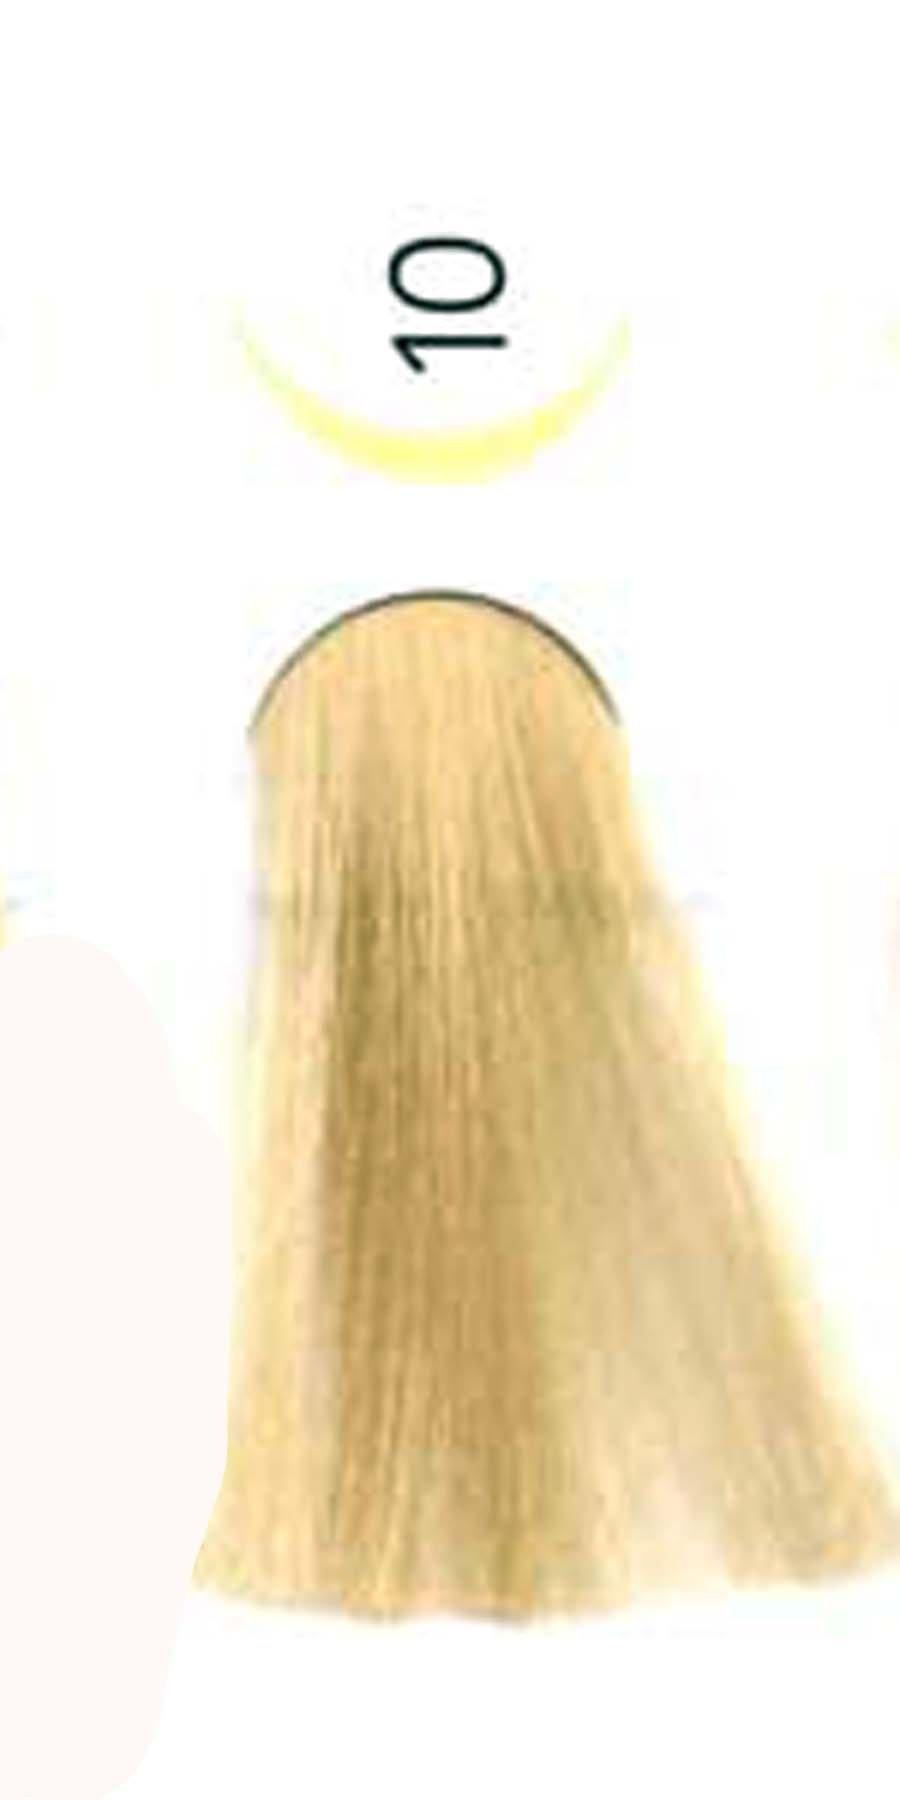 Italian Chromatique Hair Colors (10 ULTRA LIGHT NATURAL)